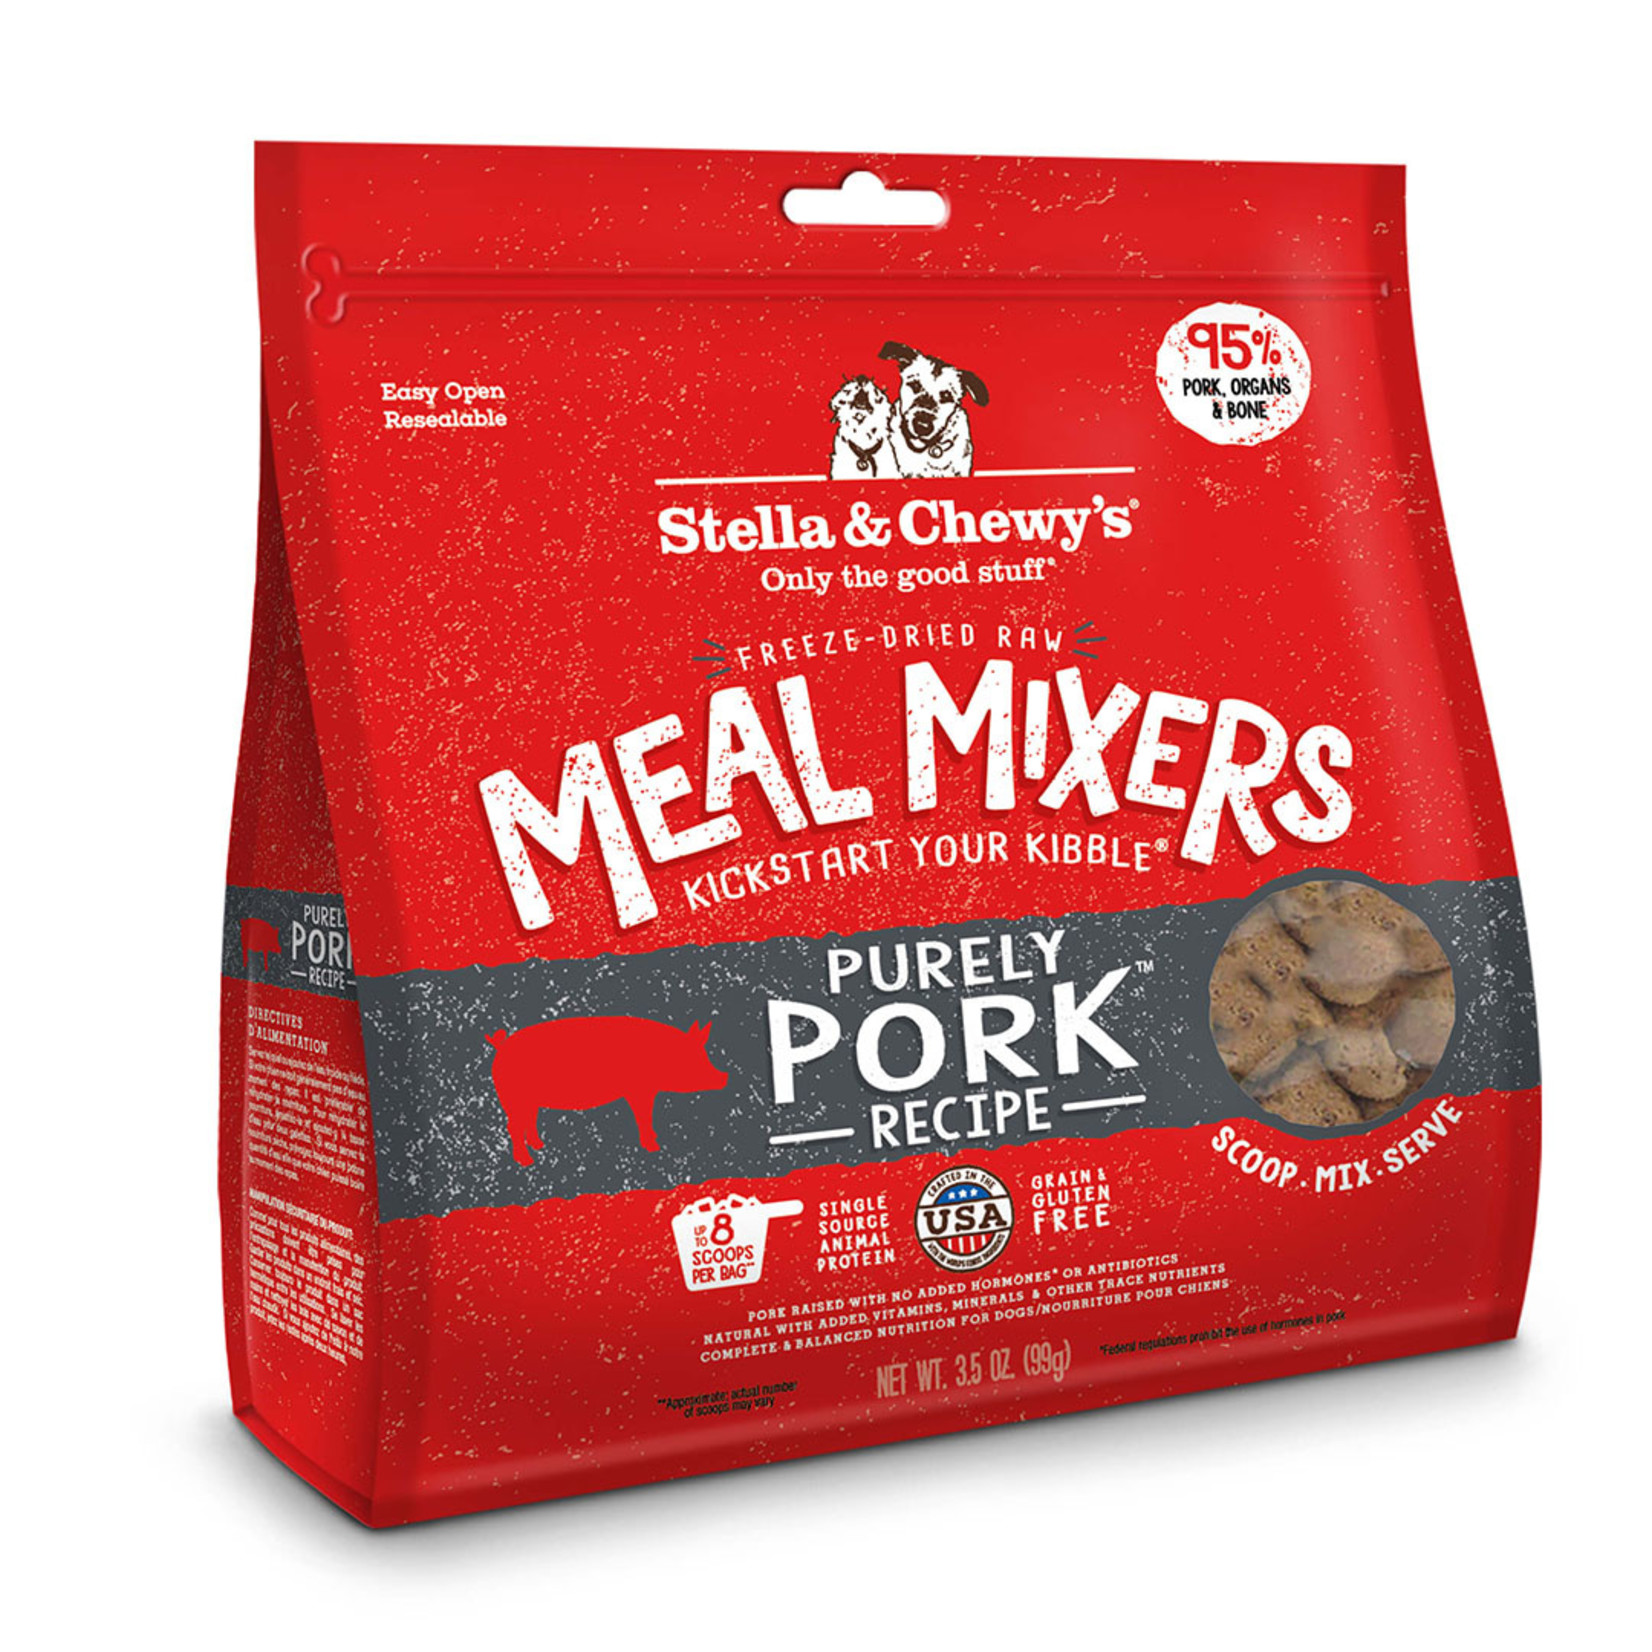 Stella & Chewys Stella Freeze-Dried Dog Meal Mixers Pork 18 OZ